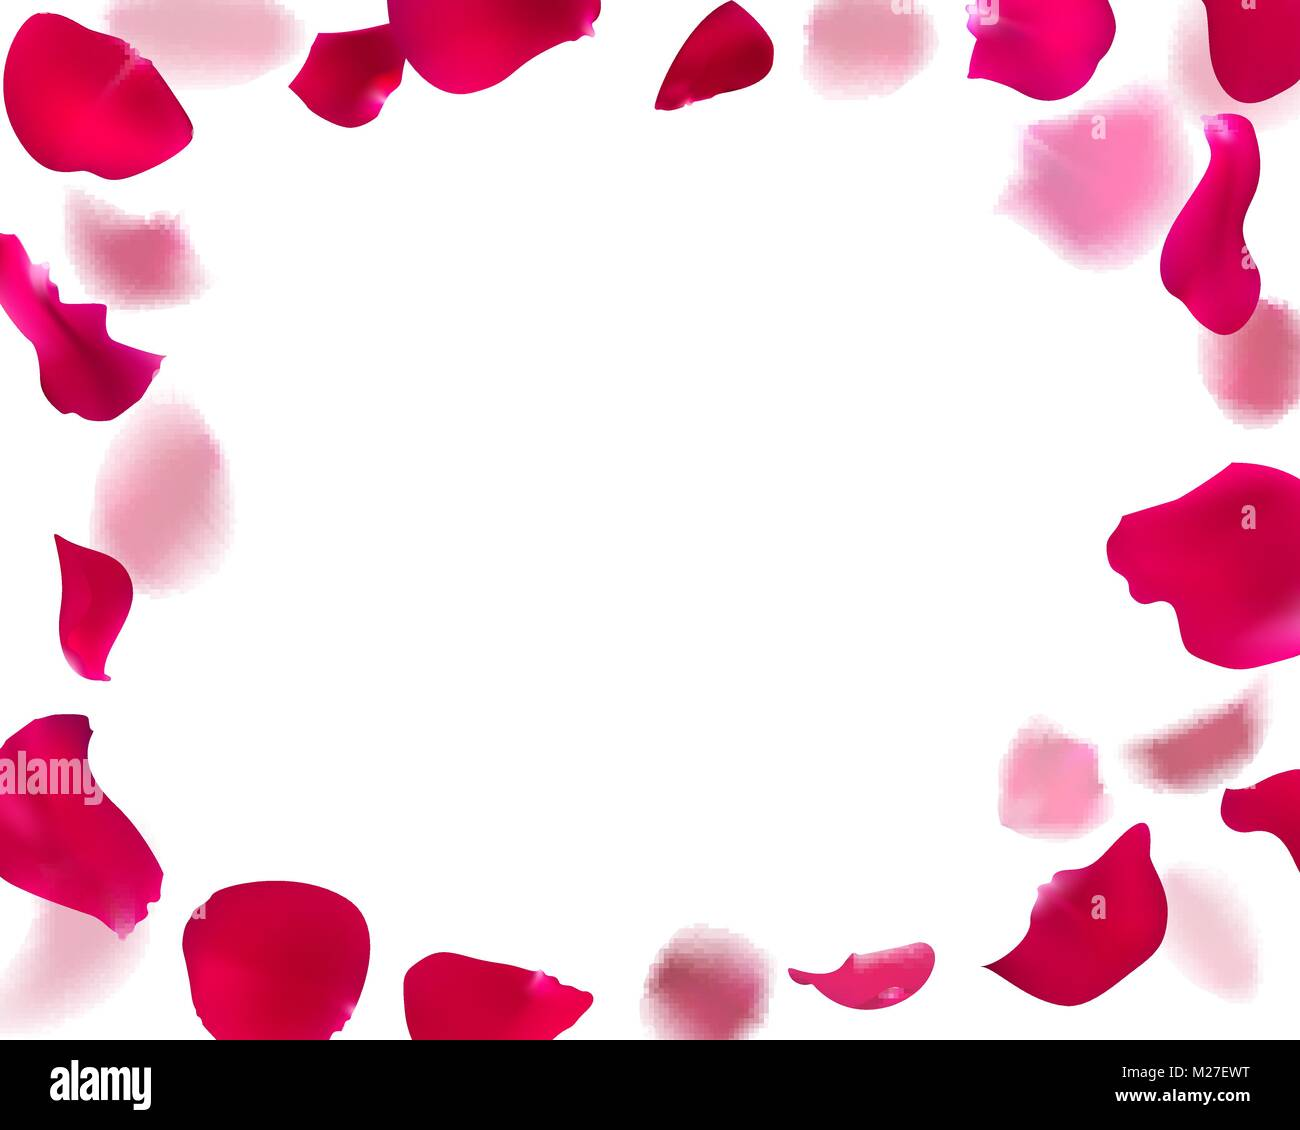 Invitation Template With Rose Petals Stock Vector Art Illustration